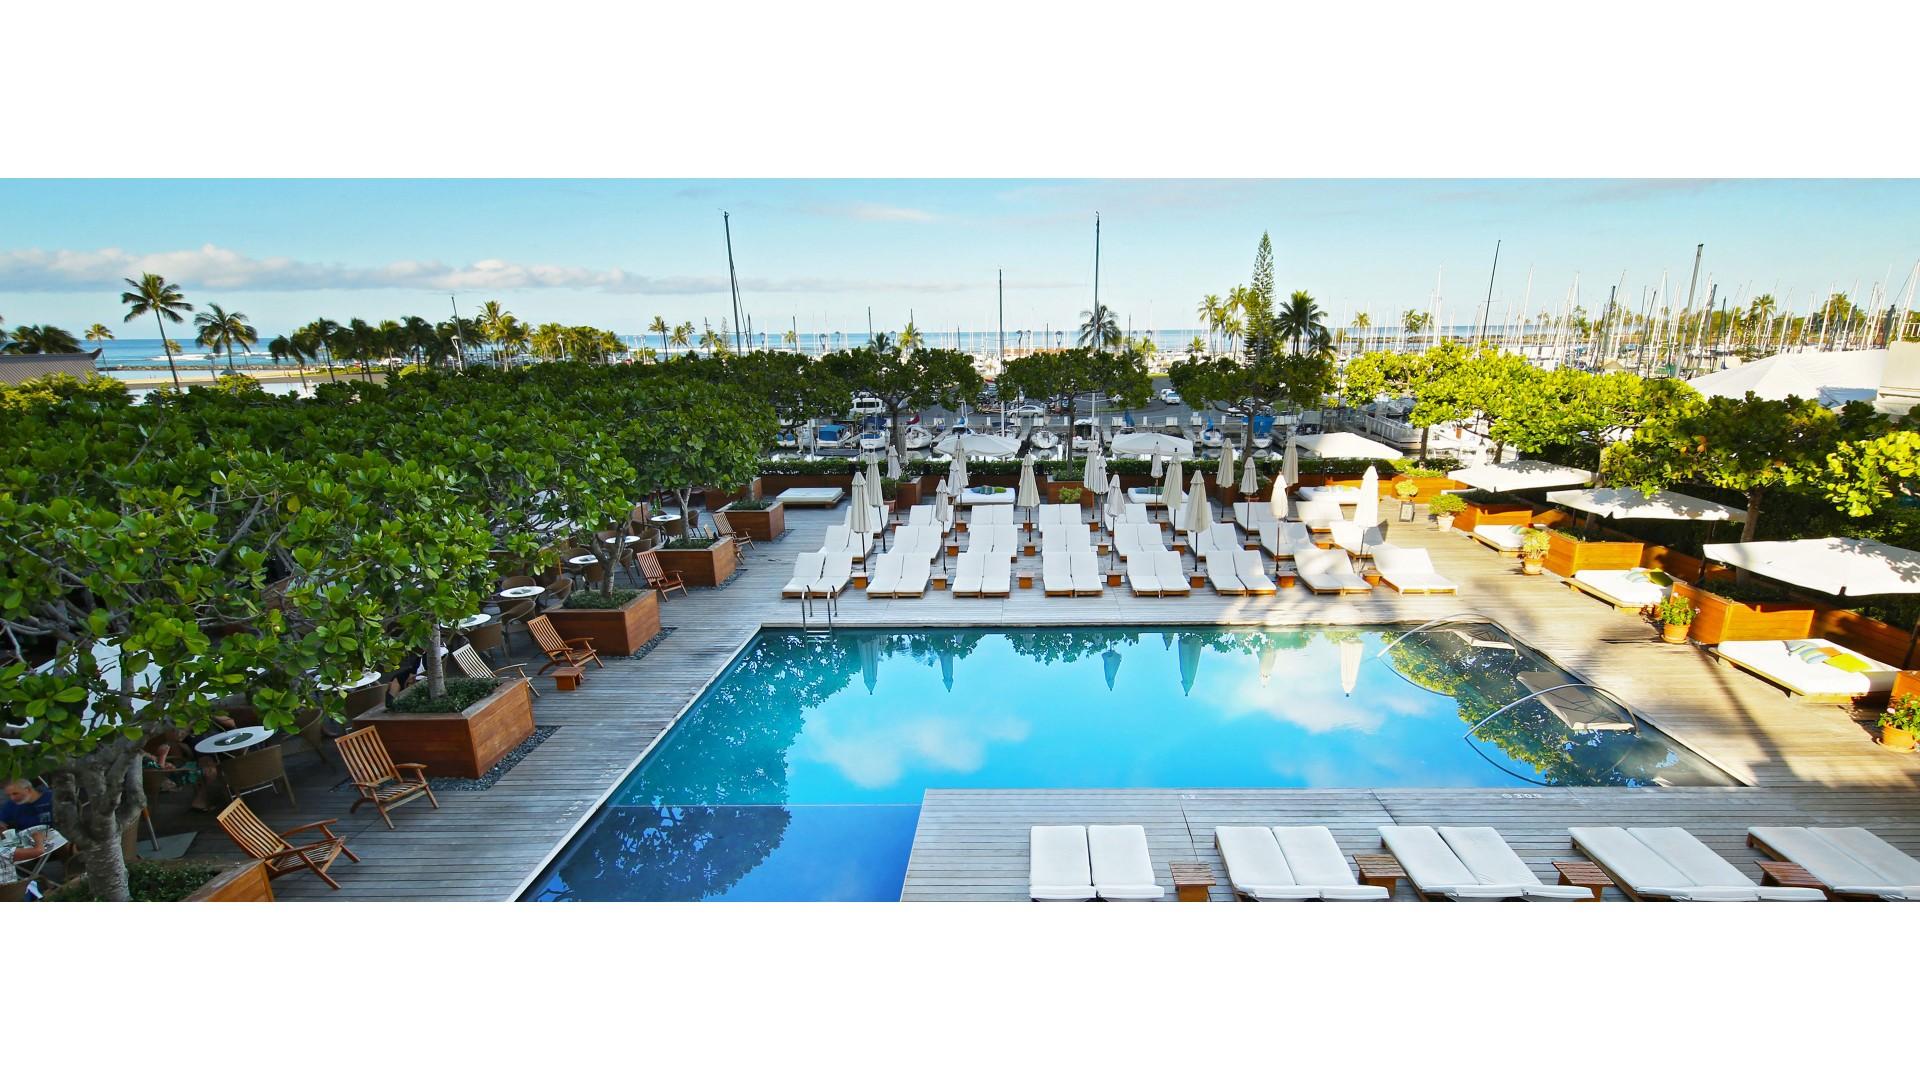 Honolulu Resort Hotels Best Kitchen Gallery | Rachelxblog cheapest ...